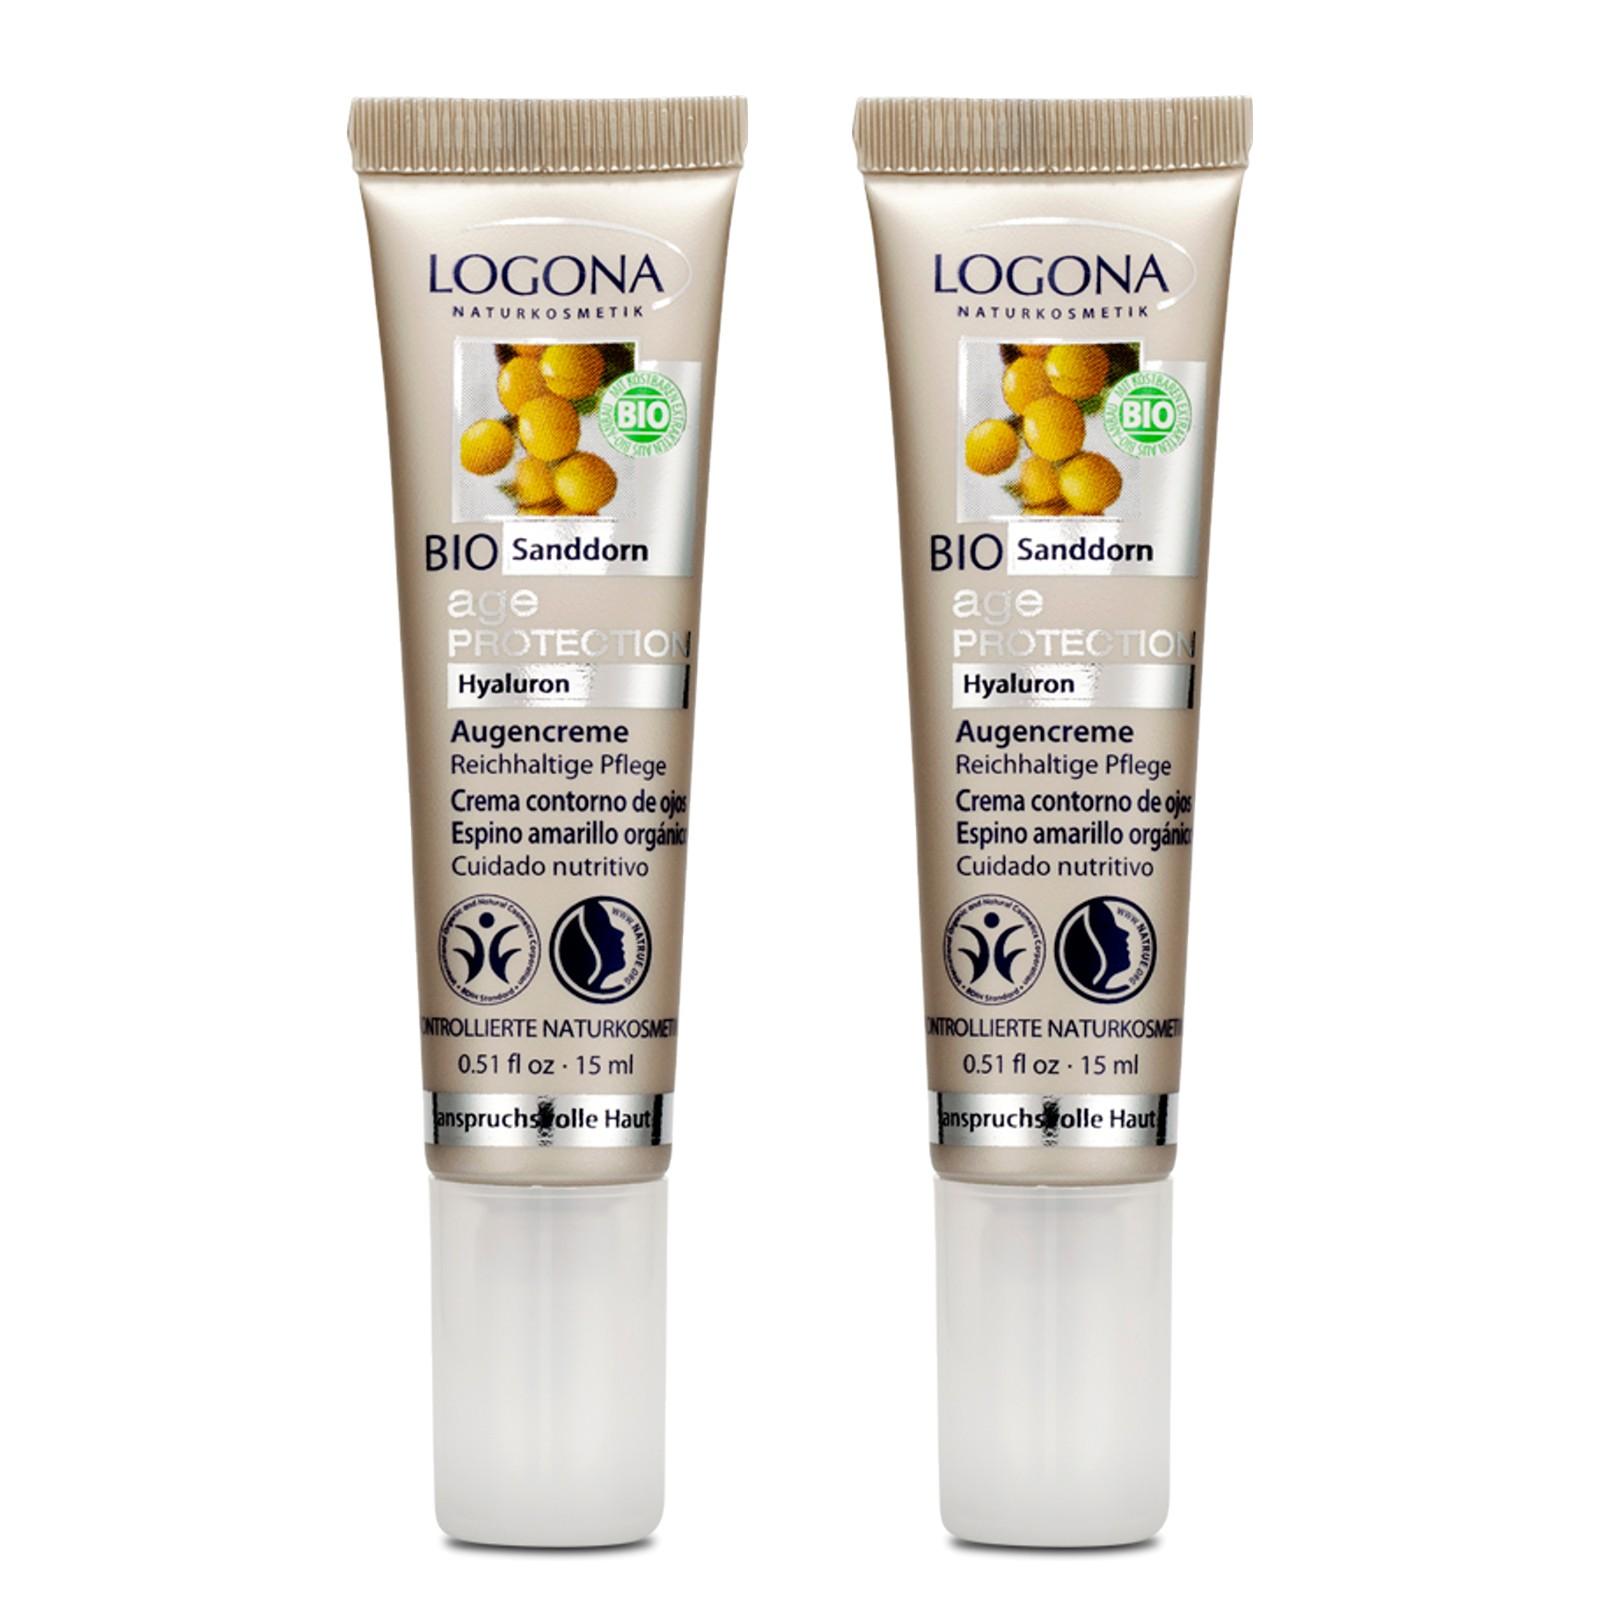 Age Protection Eye Cream Logona 15 ml Cream Sulwhasoo Men Inner Charging Serum (For Men) 140ml